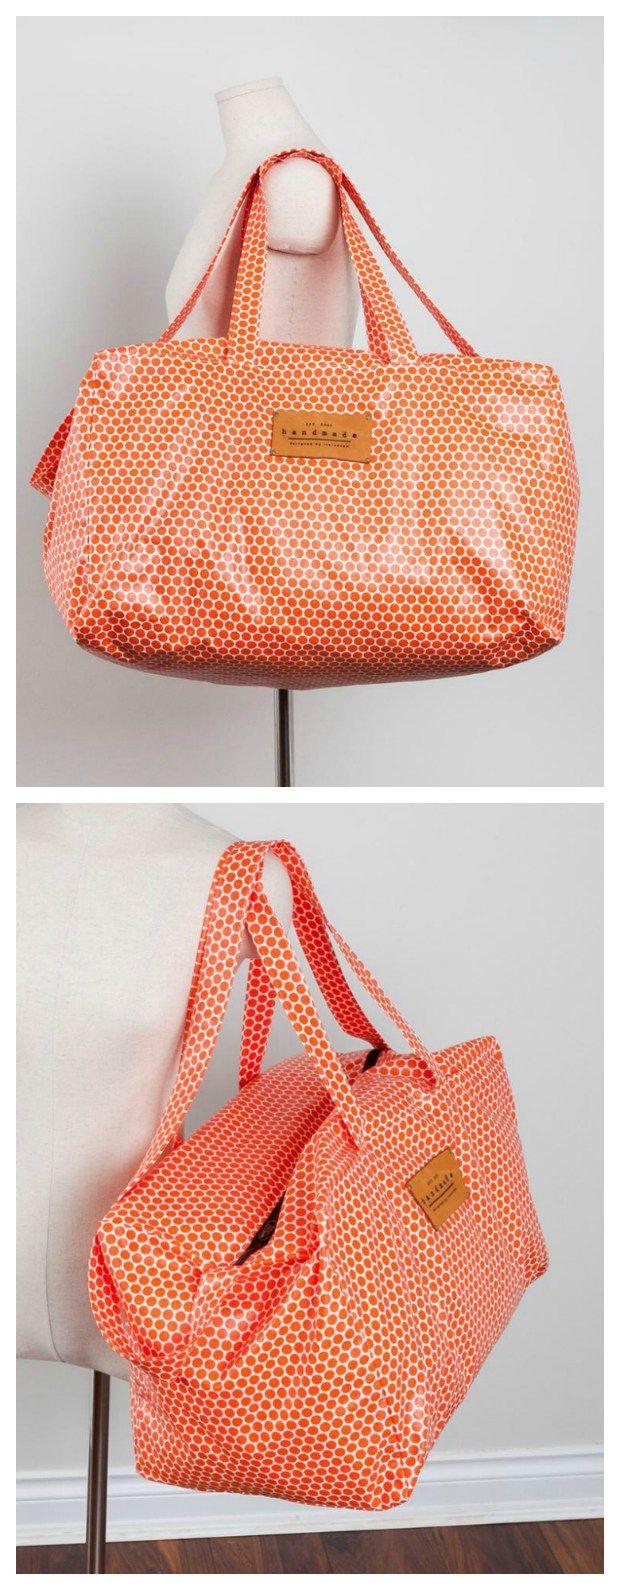 The Sharon Bag FREE pattern